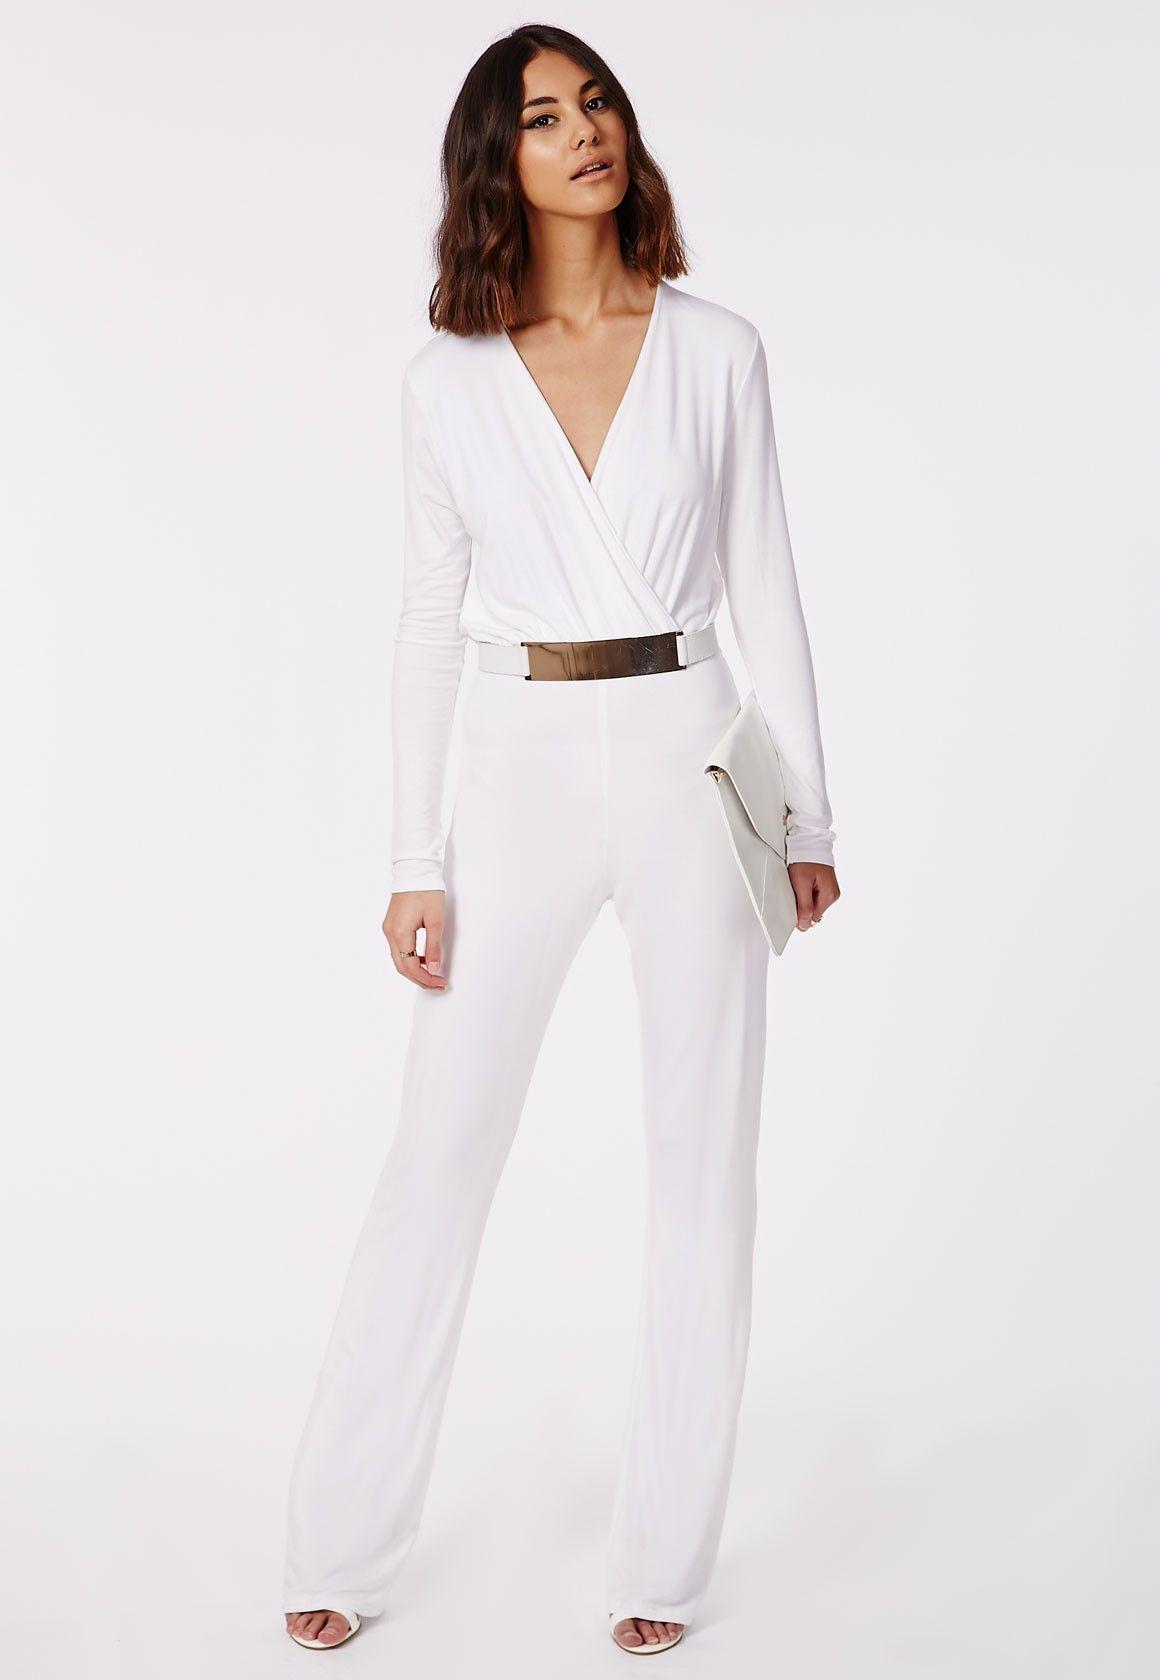 Cute Long Sleeve Jumpsuit   tenuestyle   Awesome Long Sleeve ... 885dfef531